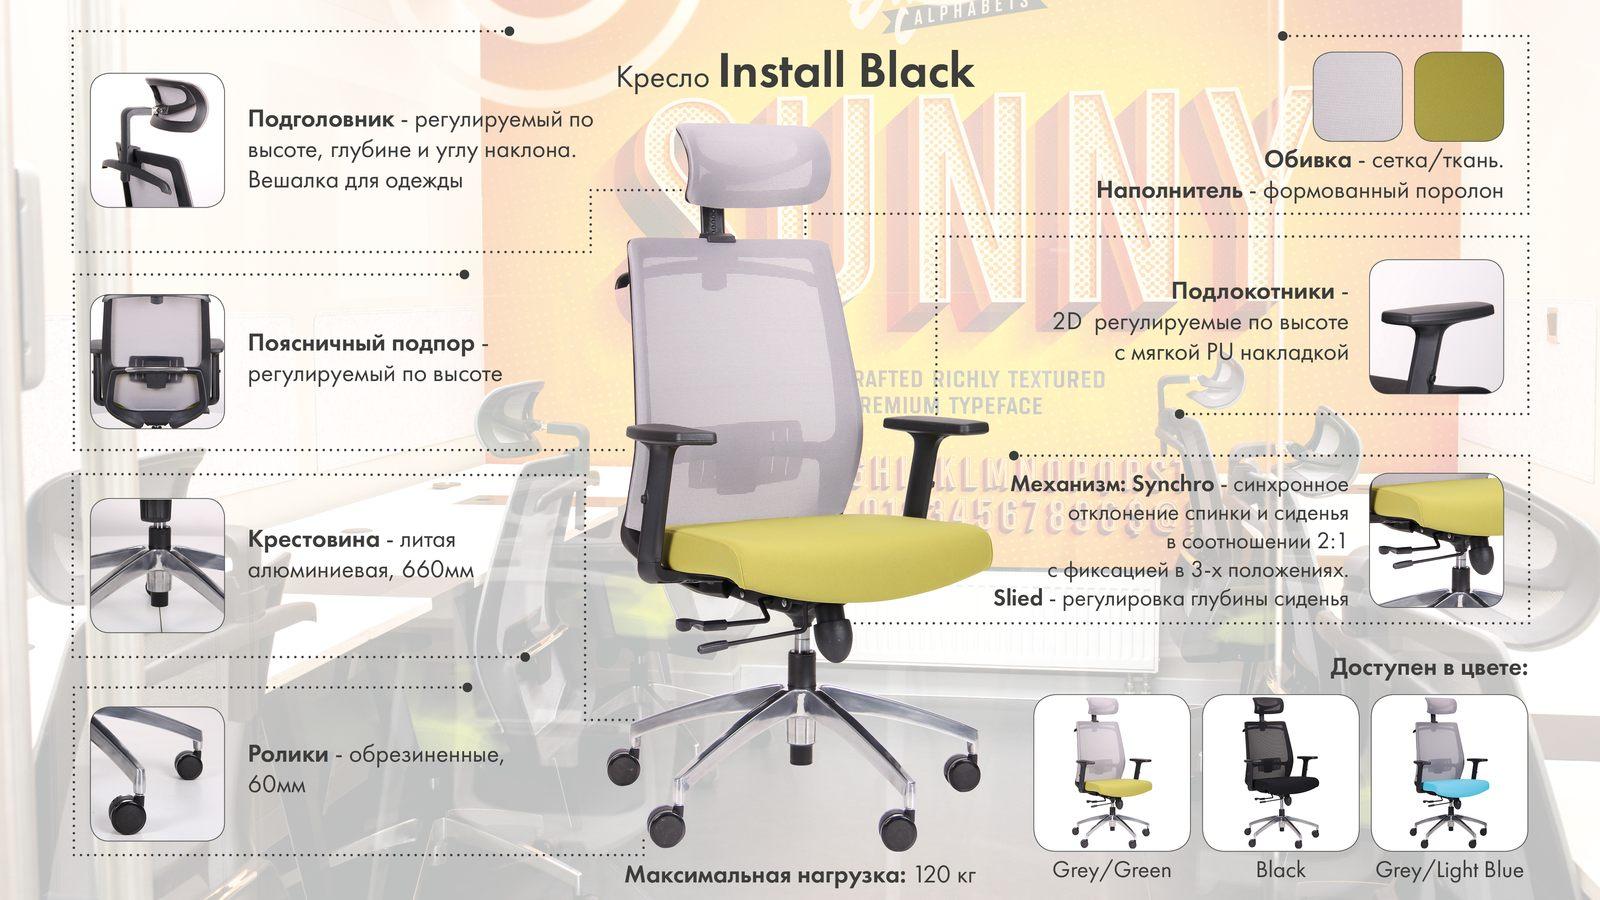 Кресло Install Black Описание